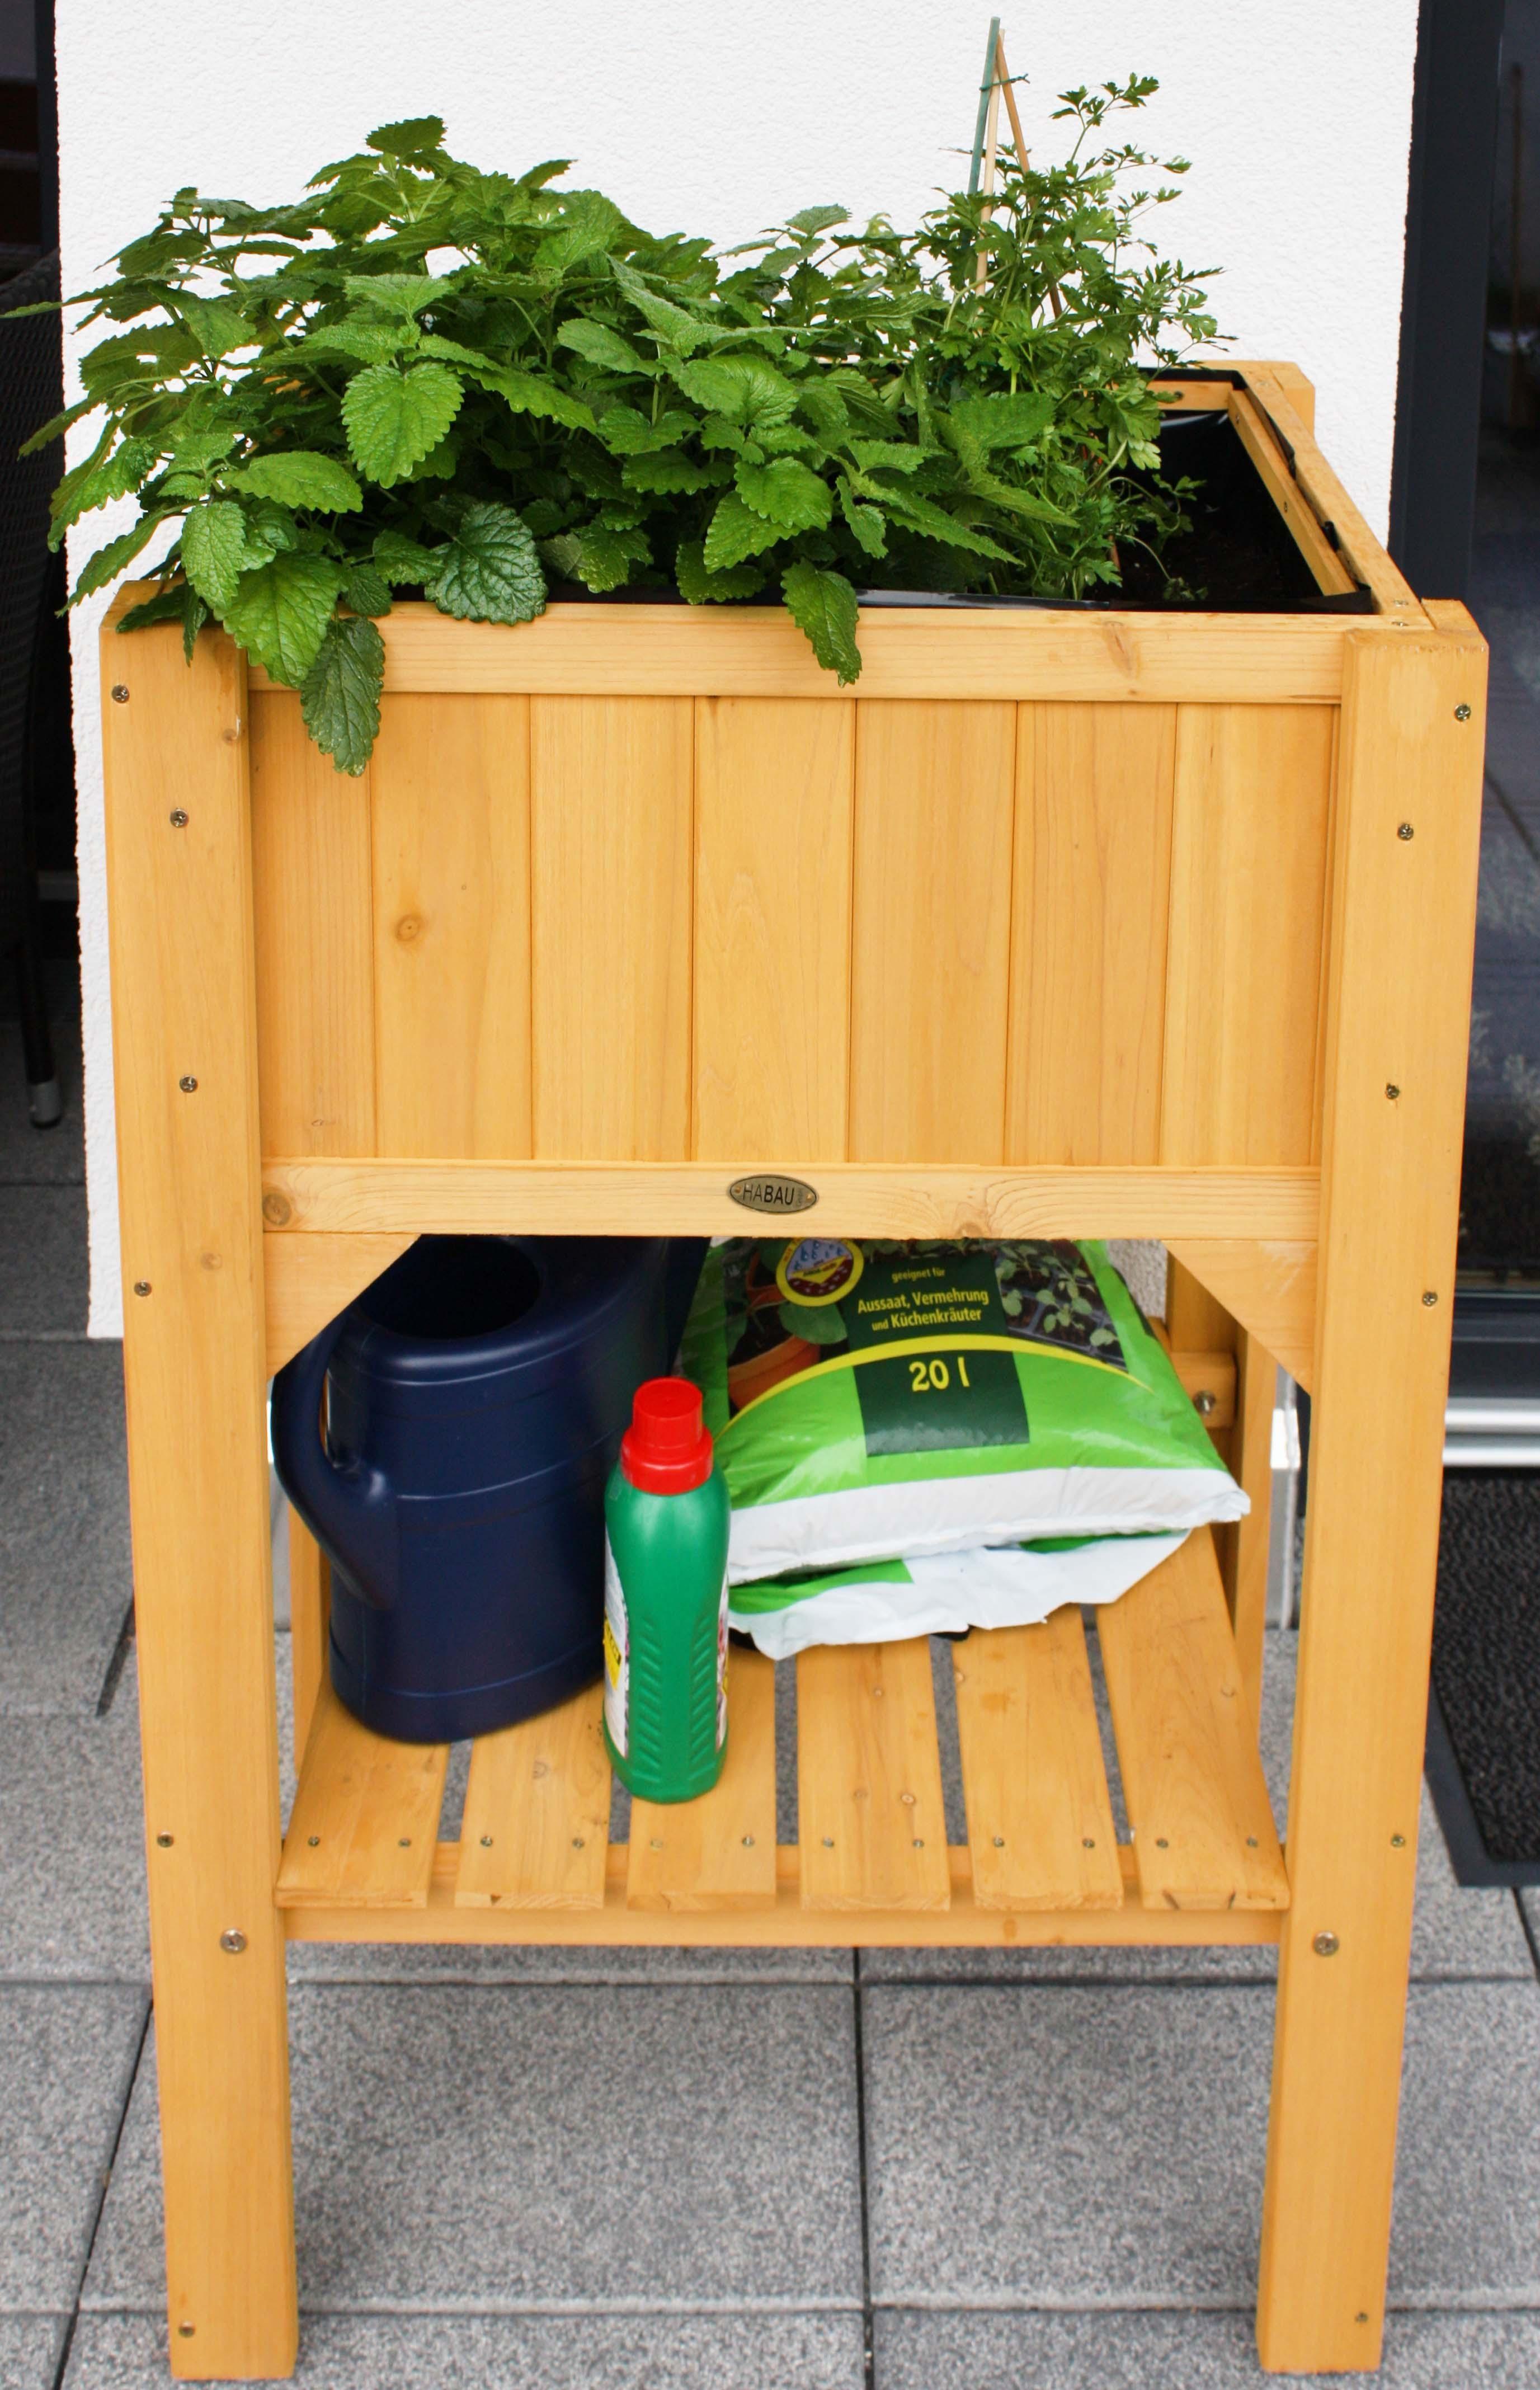 Hubsches Hochbeet Fur Den Balkon Http Amzn To 2nefqfi Hochbeet Wohnraumgestaltung Gartenblog